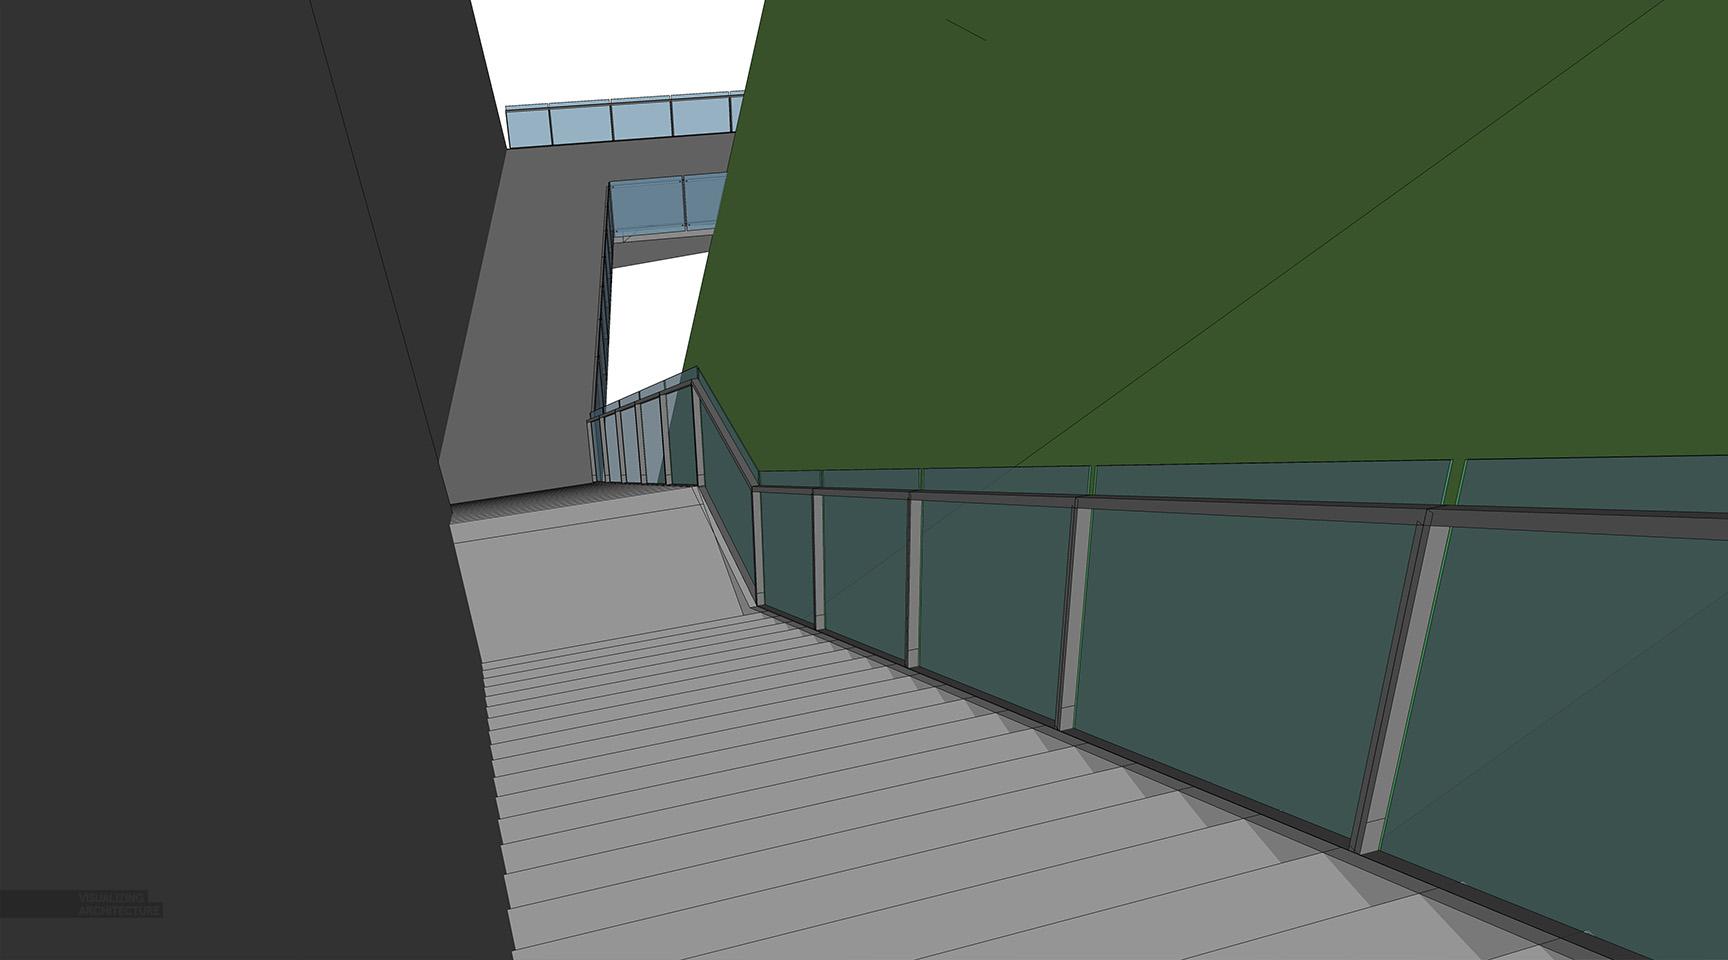 SketchUp 模型视角